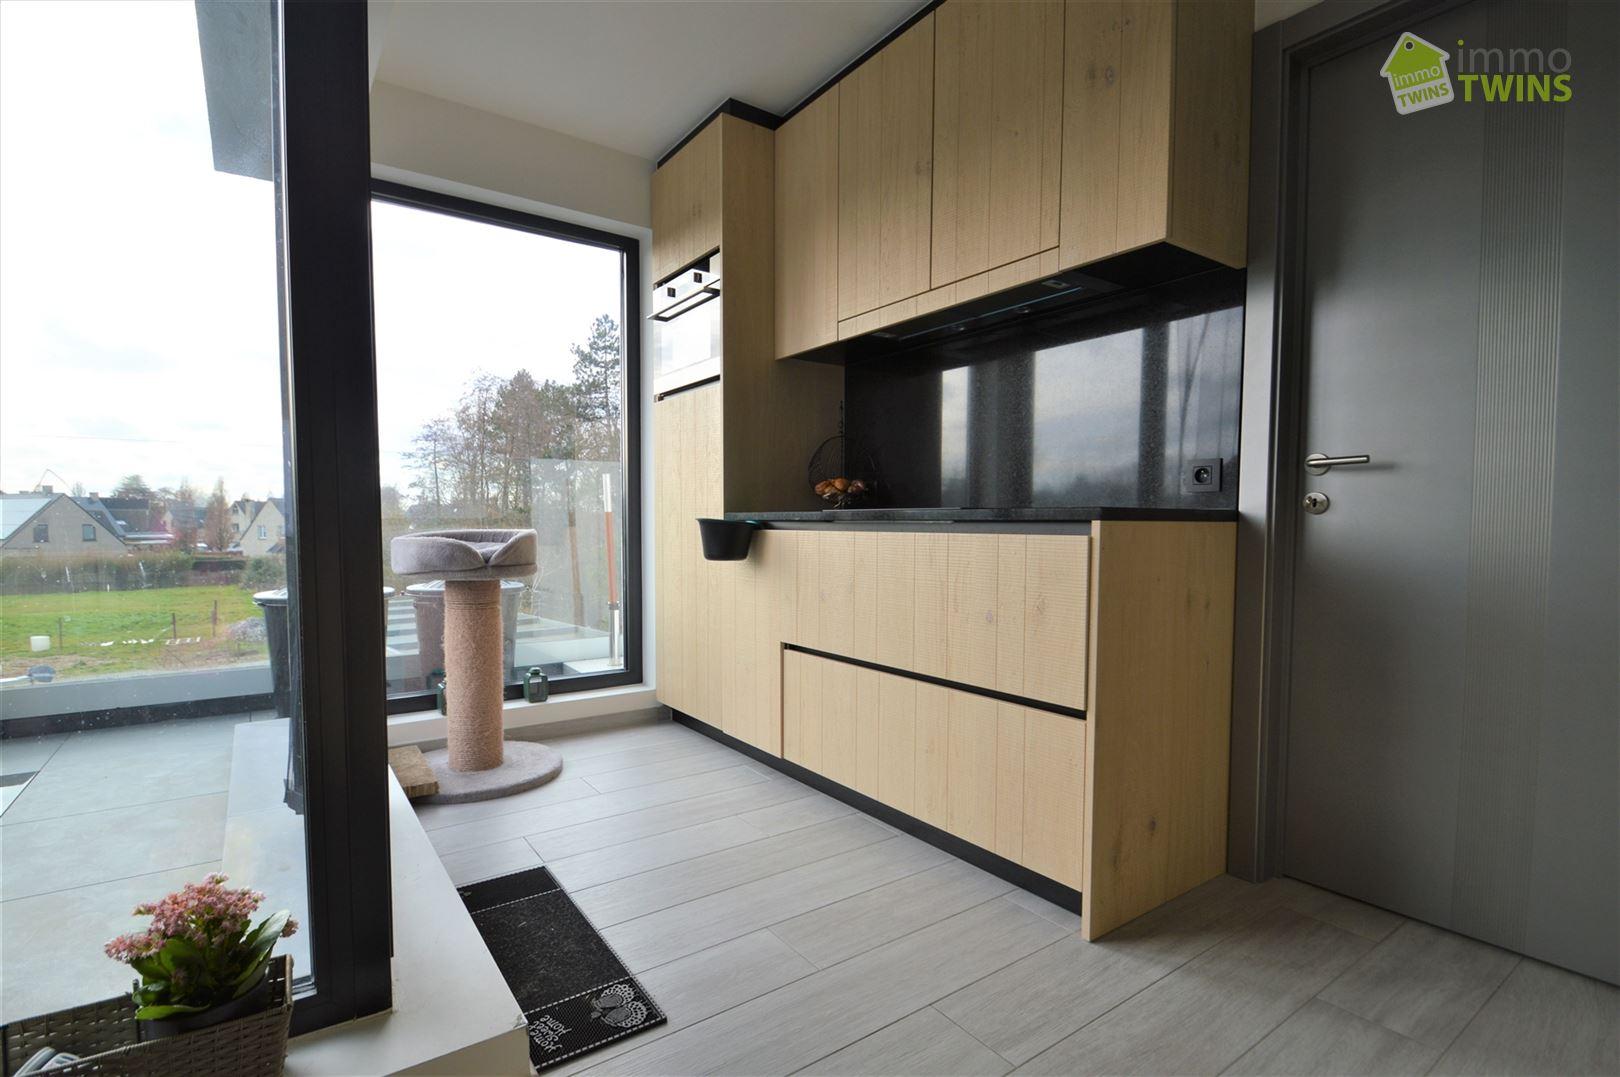 Foto 6 : Appartement te 9280 LEBBEKE (België) - Prijs € 810